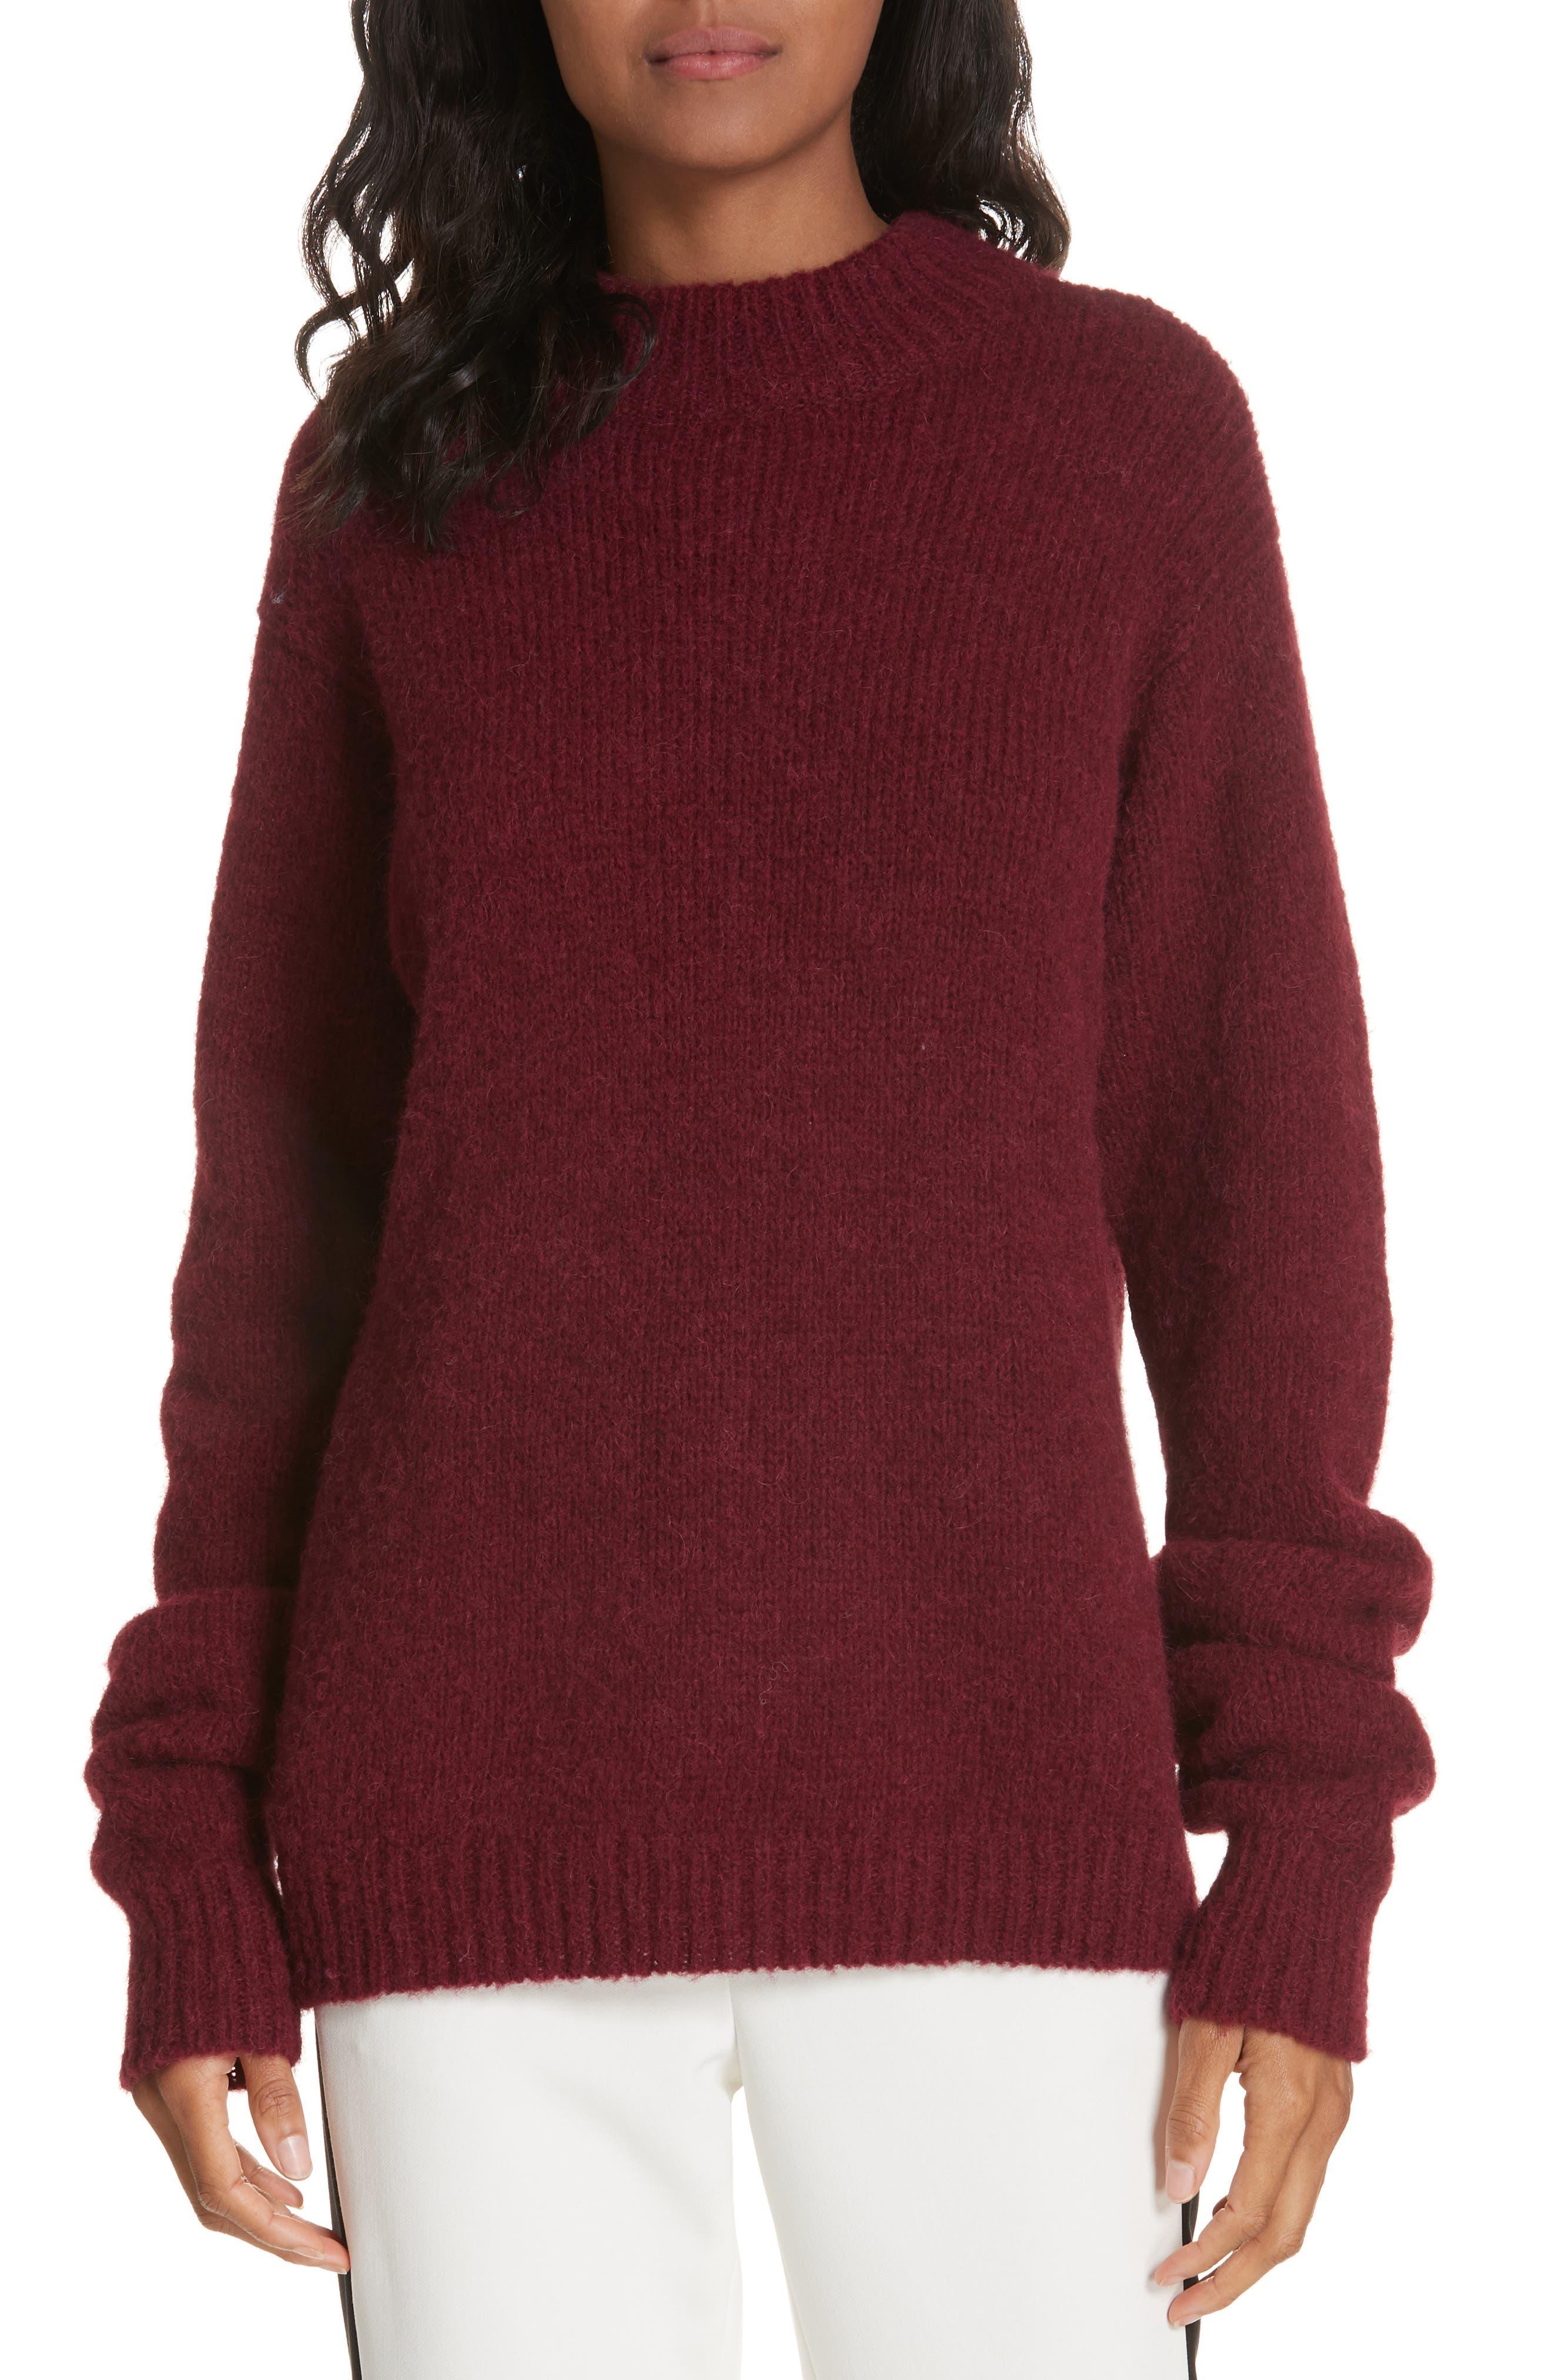 Tibi Cozette Alpaca & Wool Blend Sweater, Burgundy